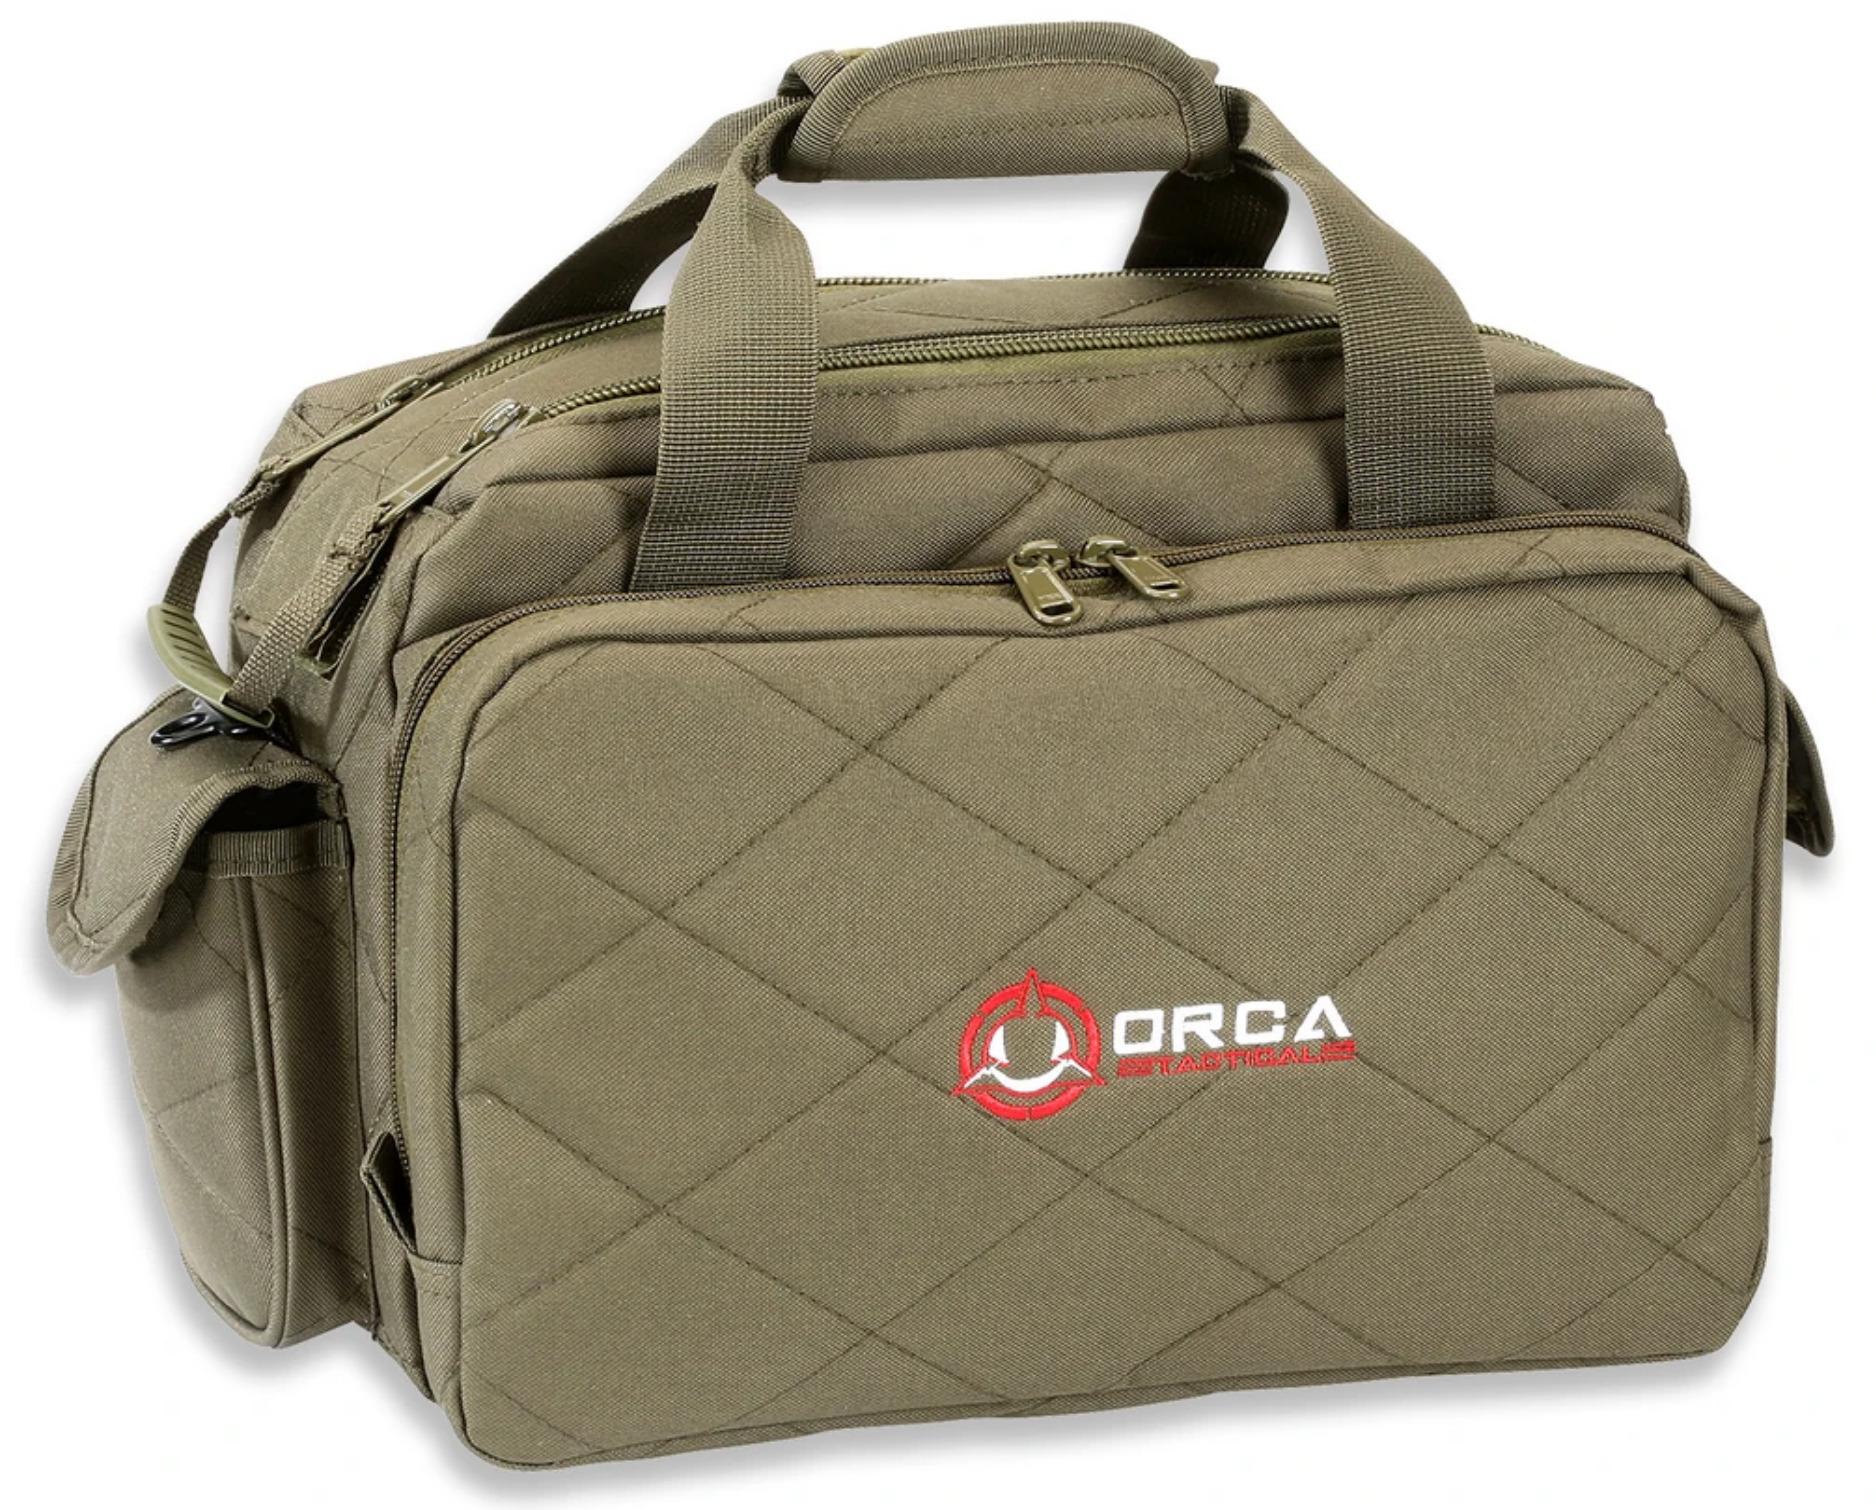 Orca Tactical Shooting Range Duffel Bag